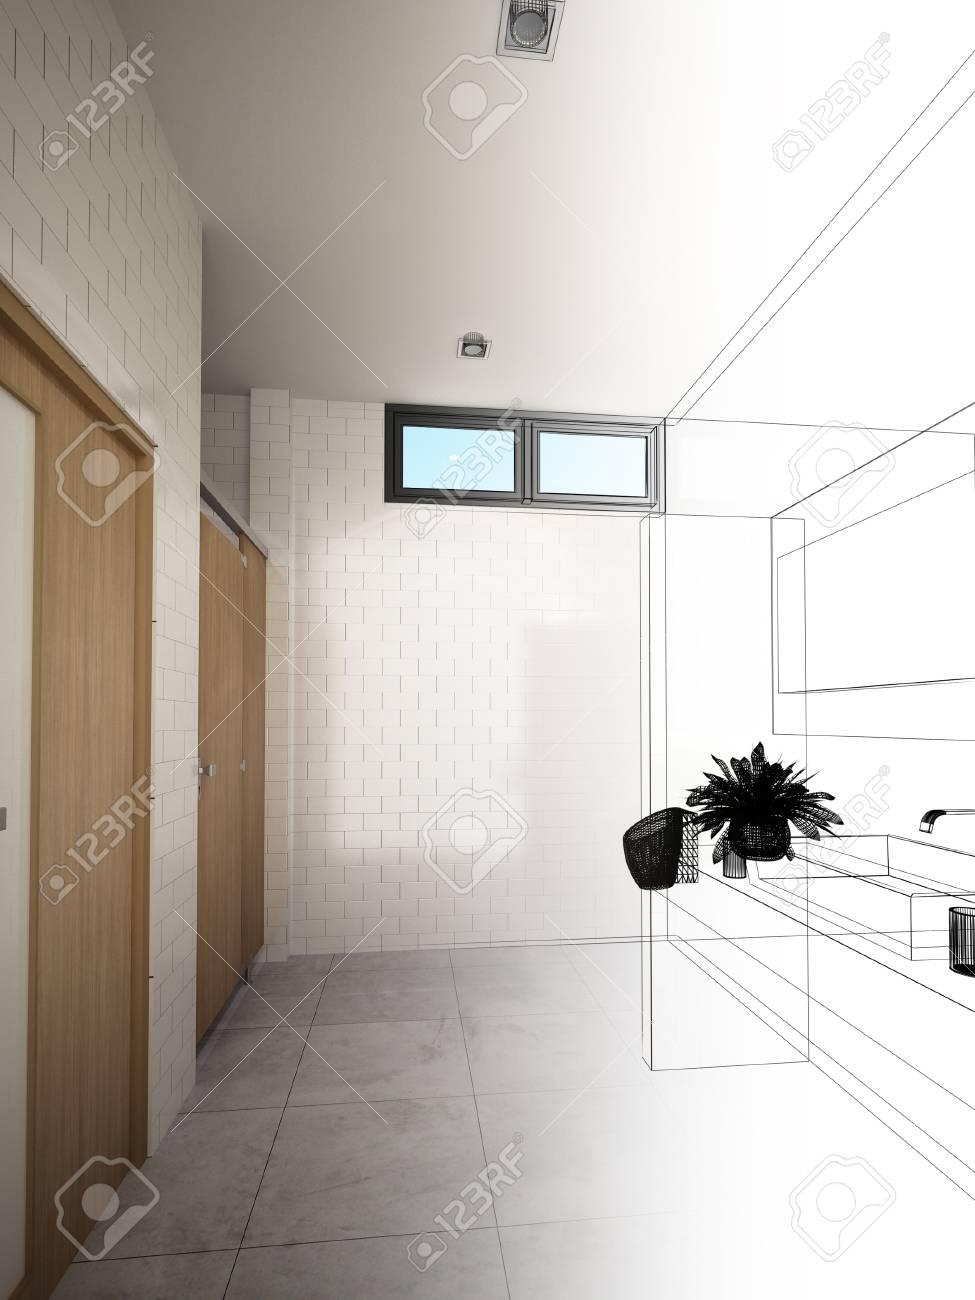 Abstract Sketch Design Of Interior Bathroom ,3d Rendering Stock ...